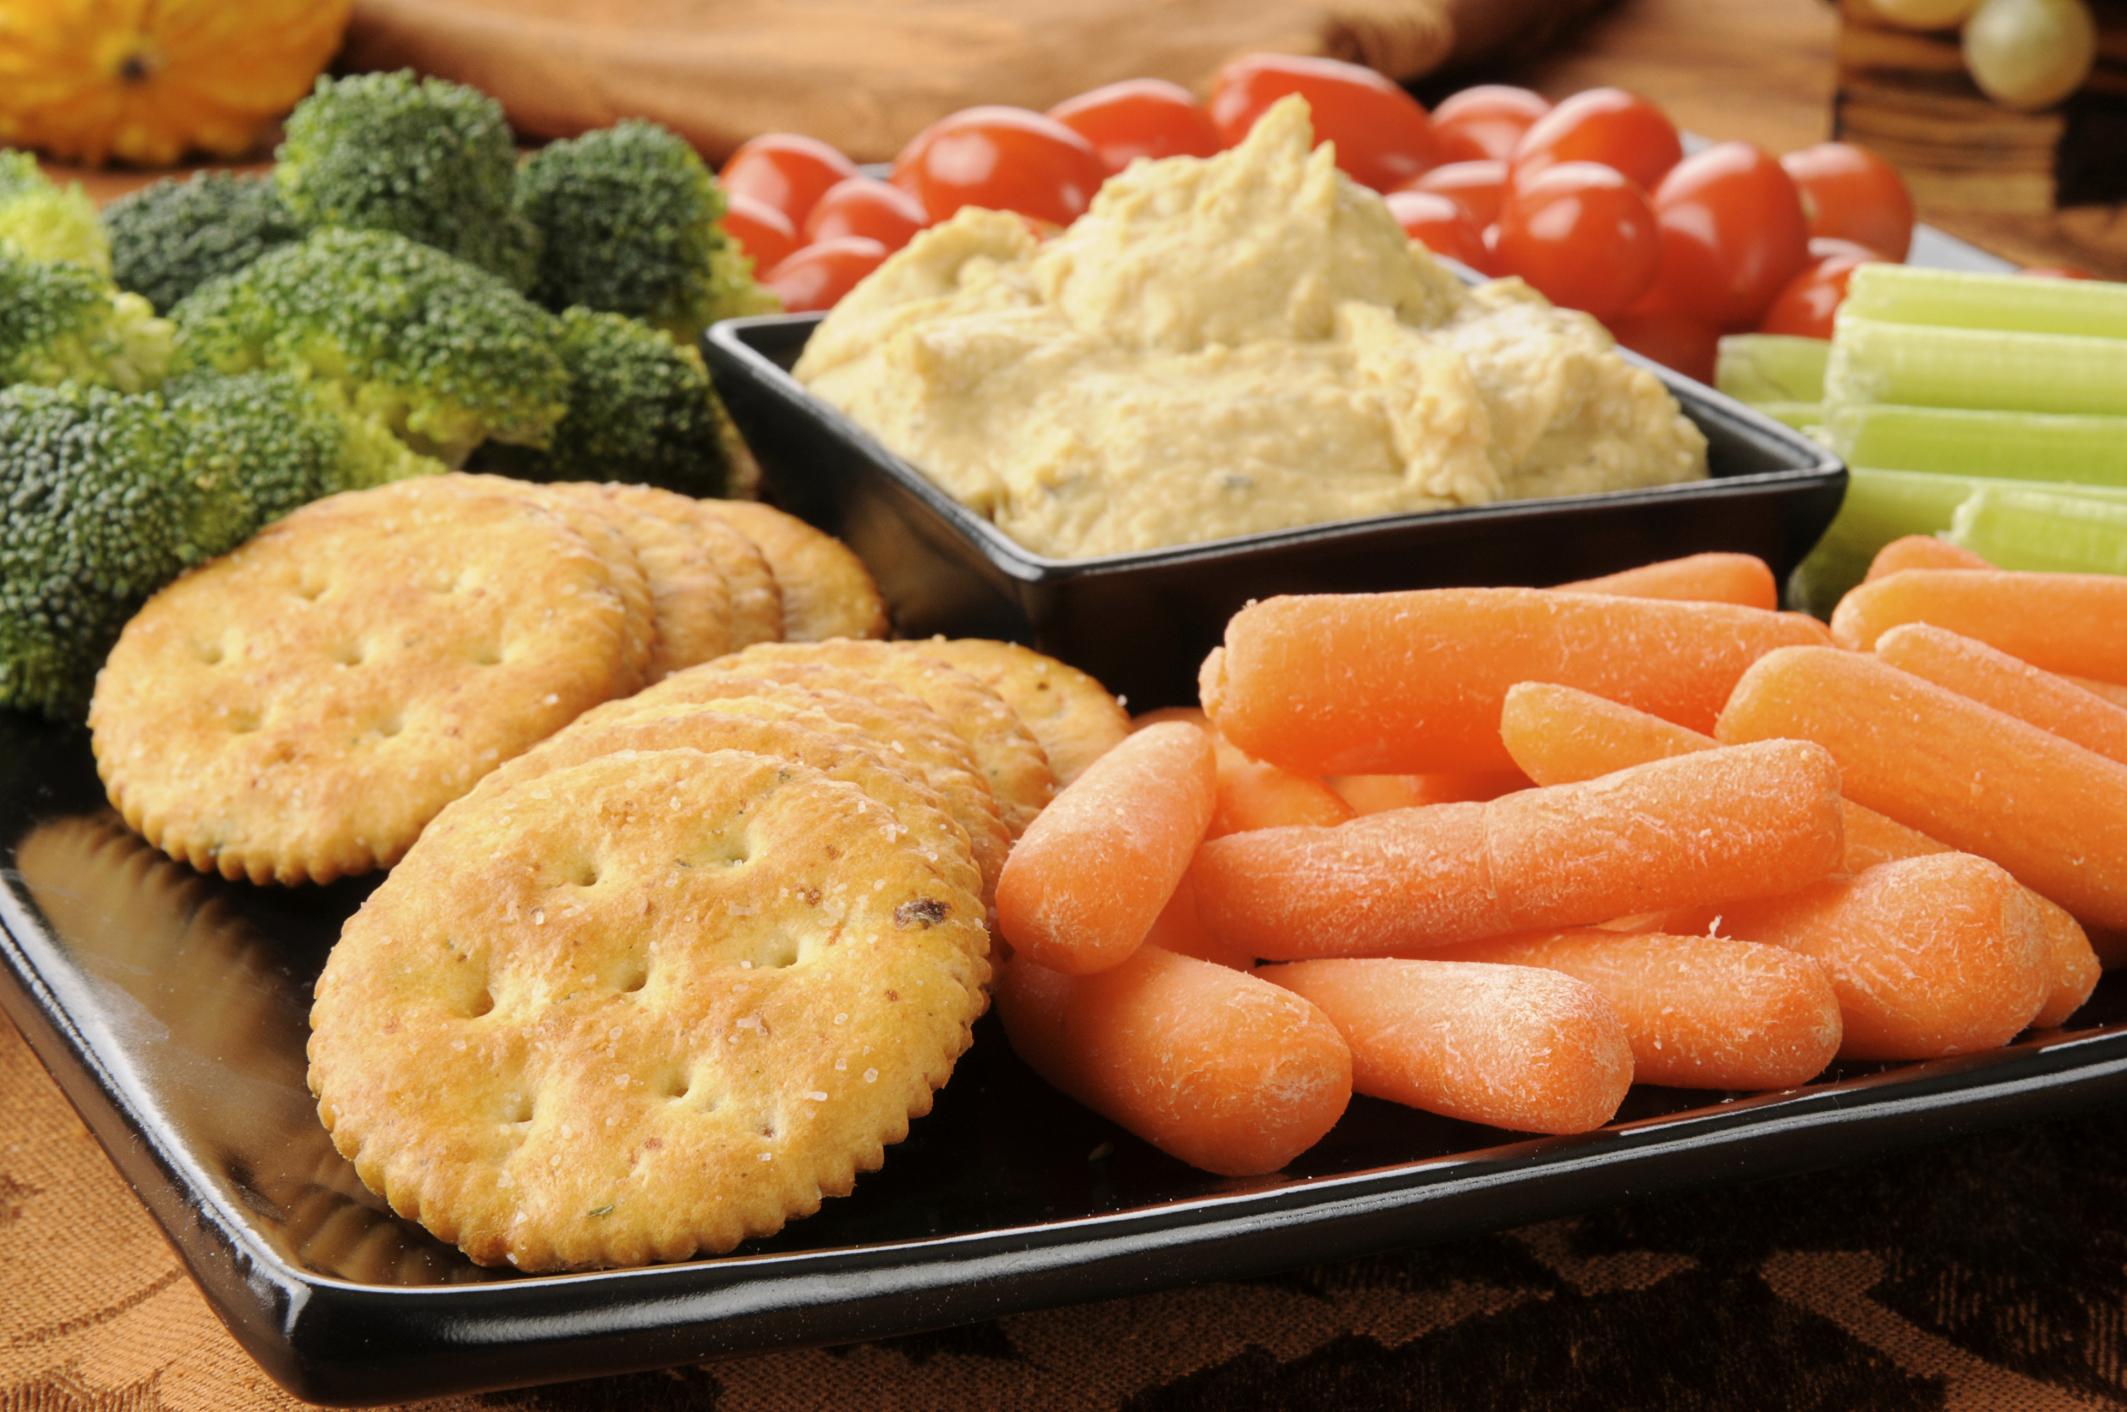 Healthy snacks online mumbai